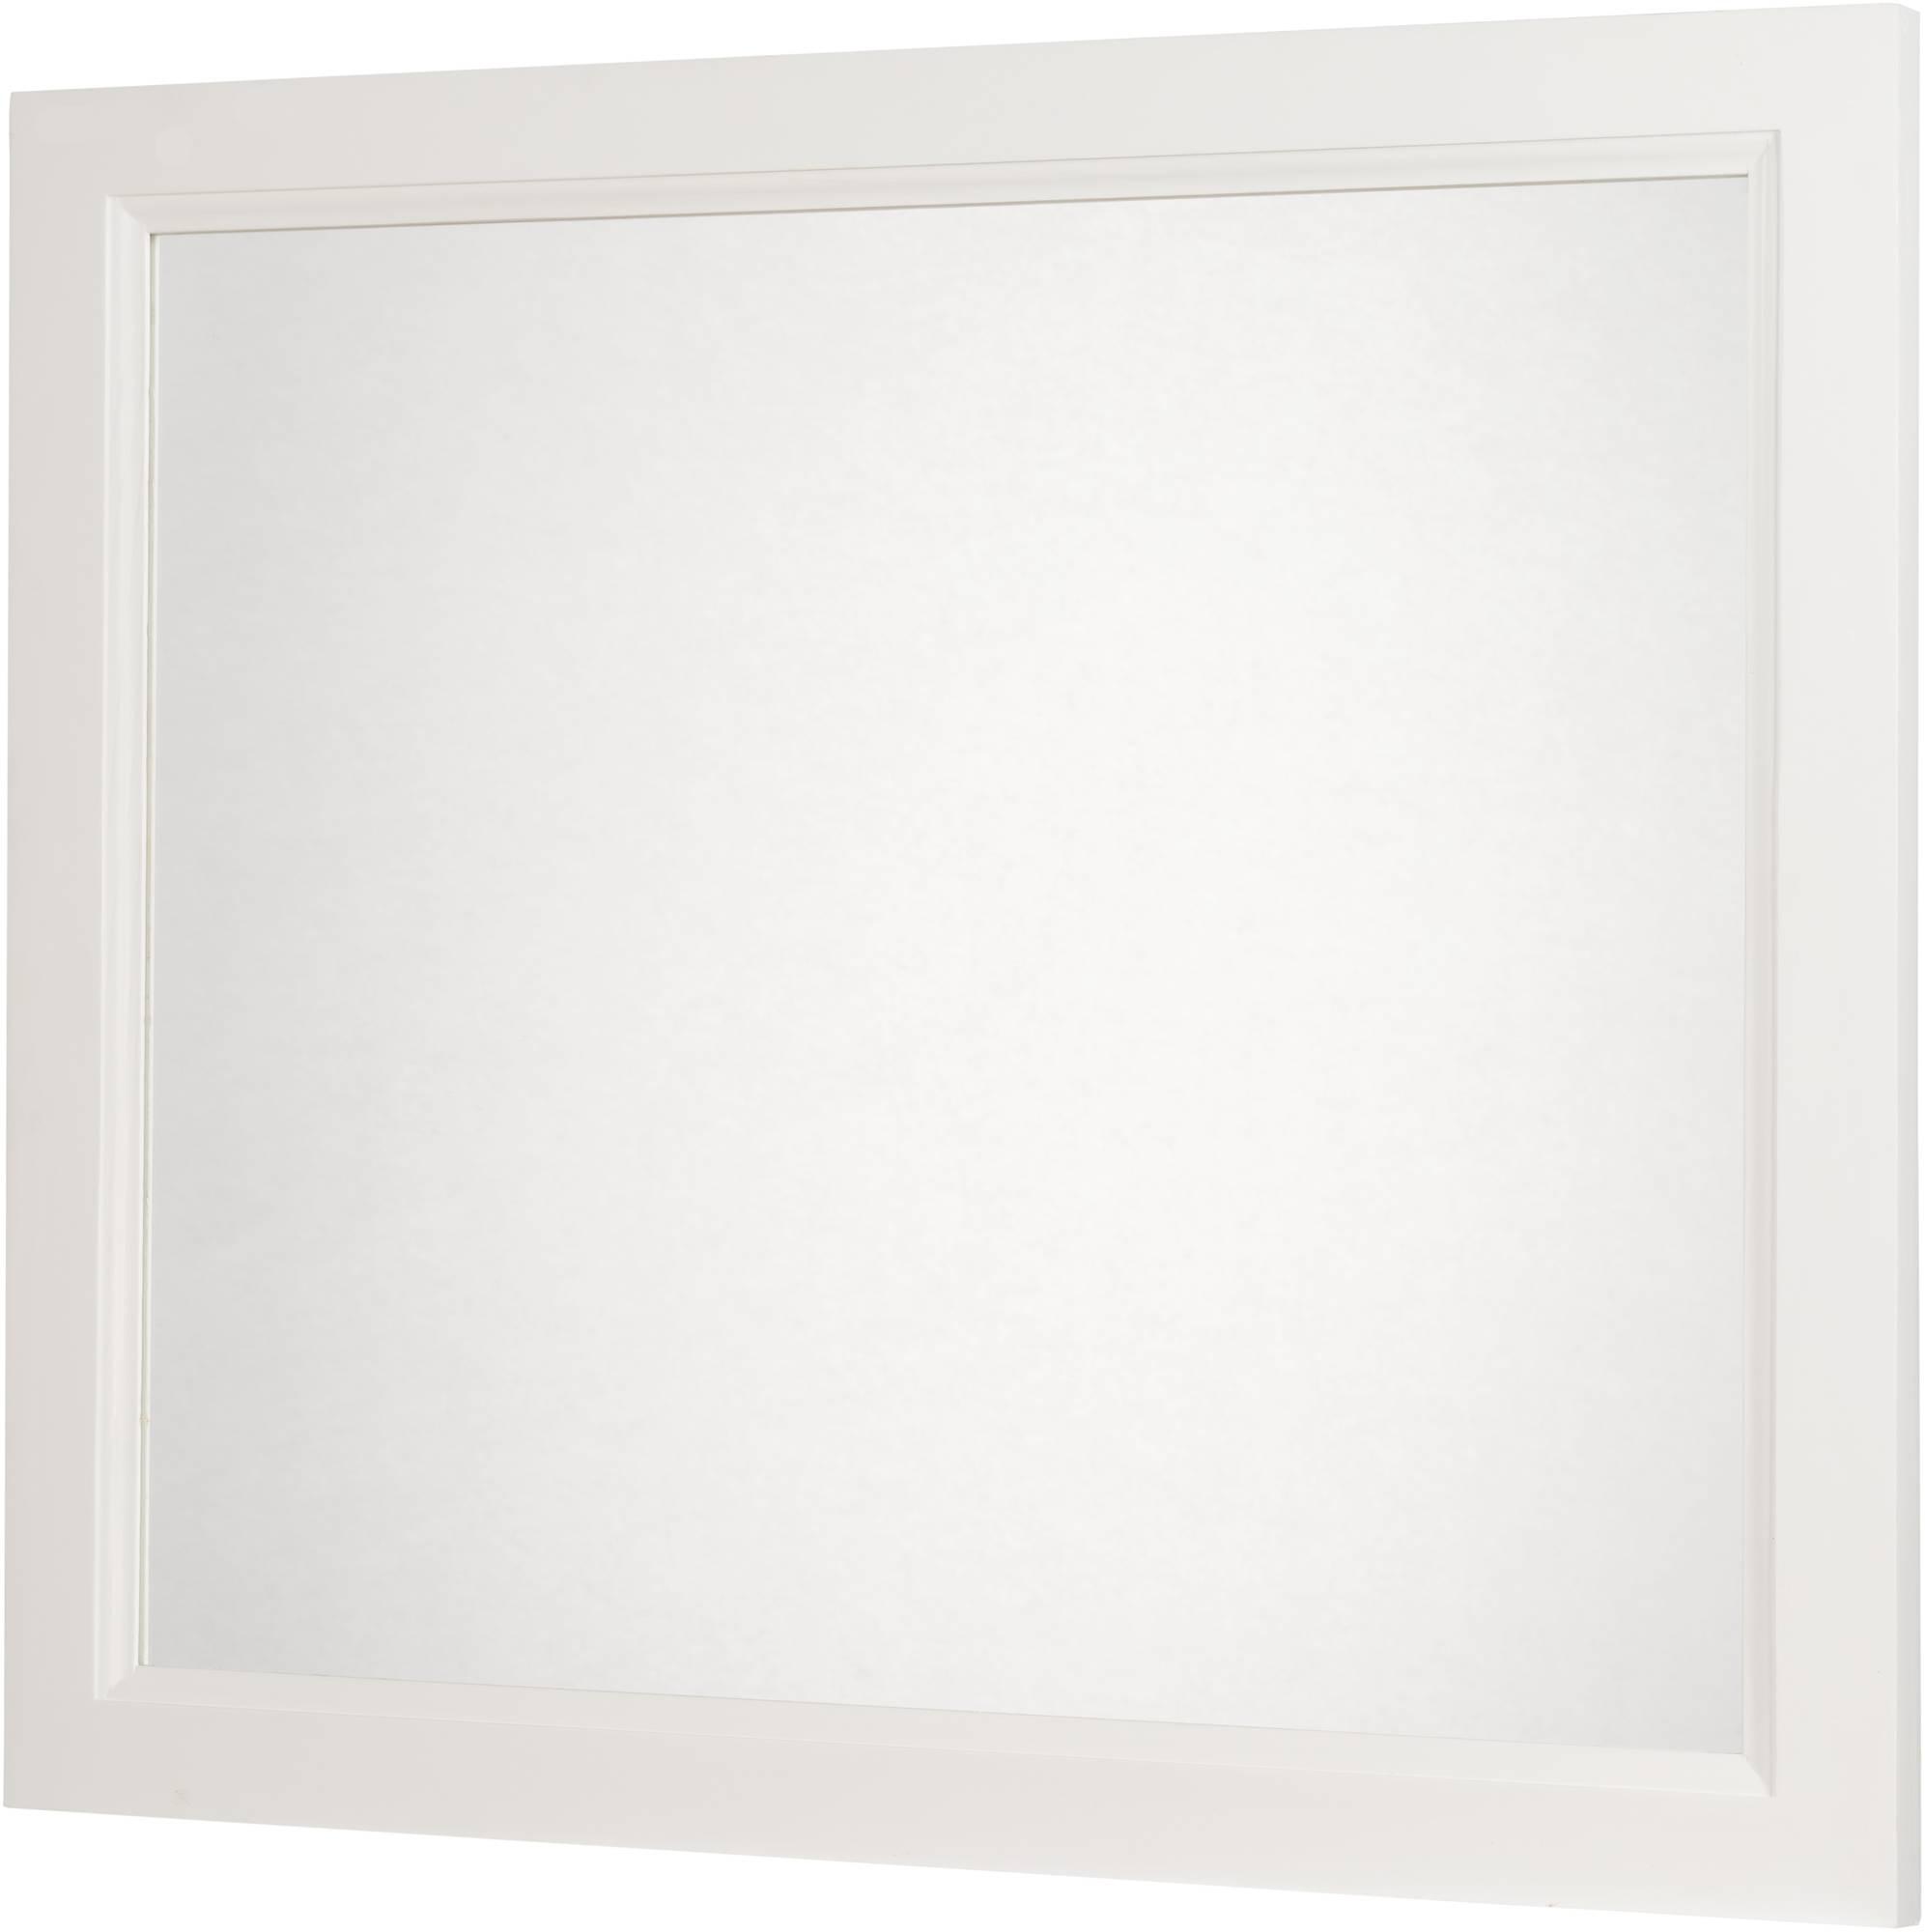 Ben Maison Spiegel 80 cm wit met lijst